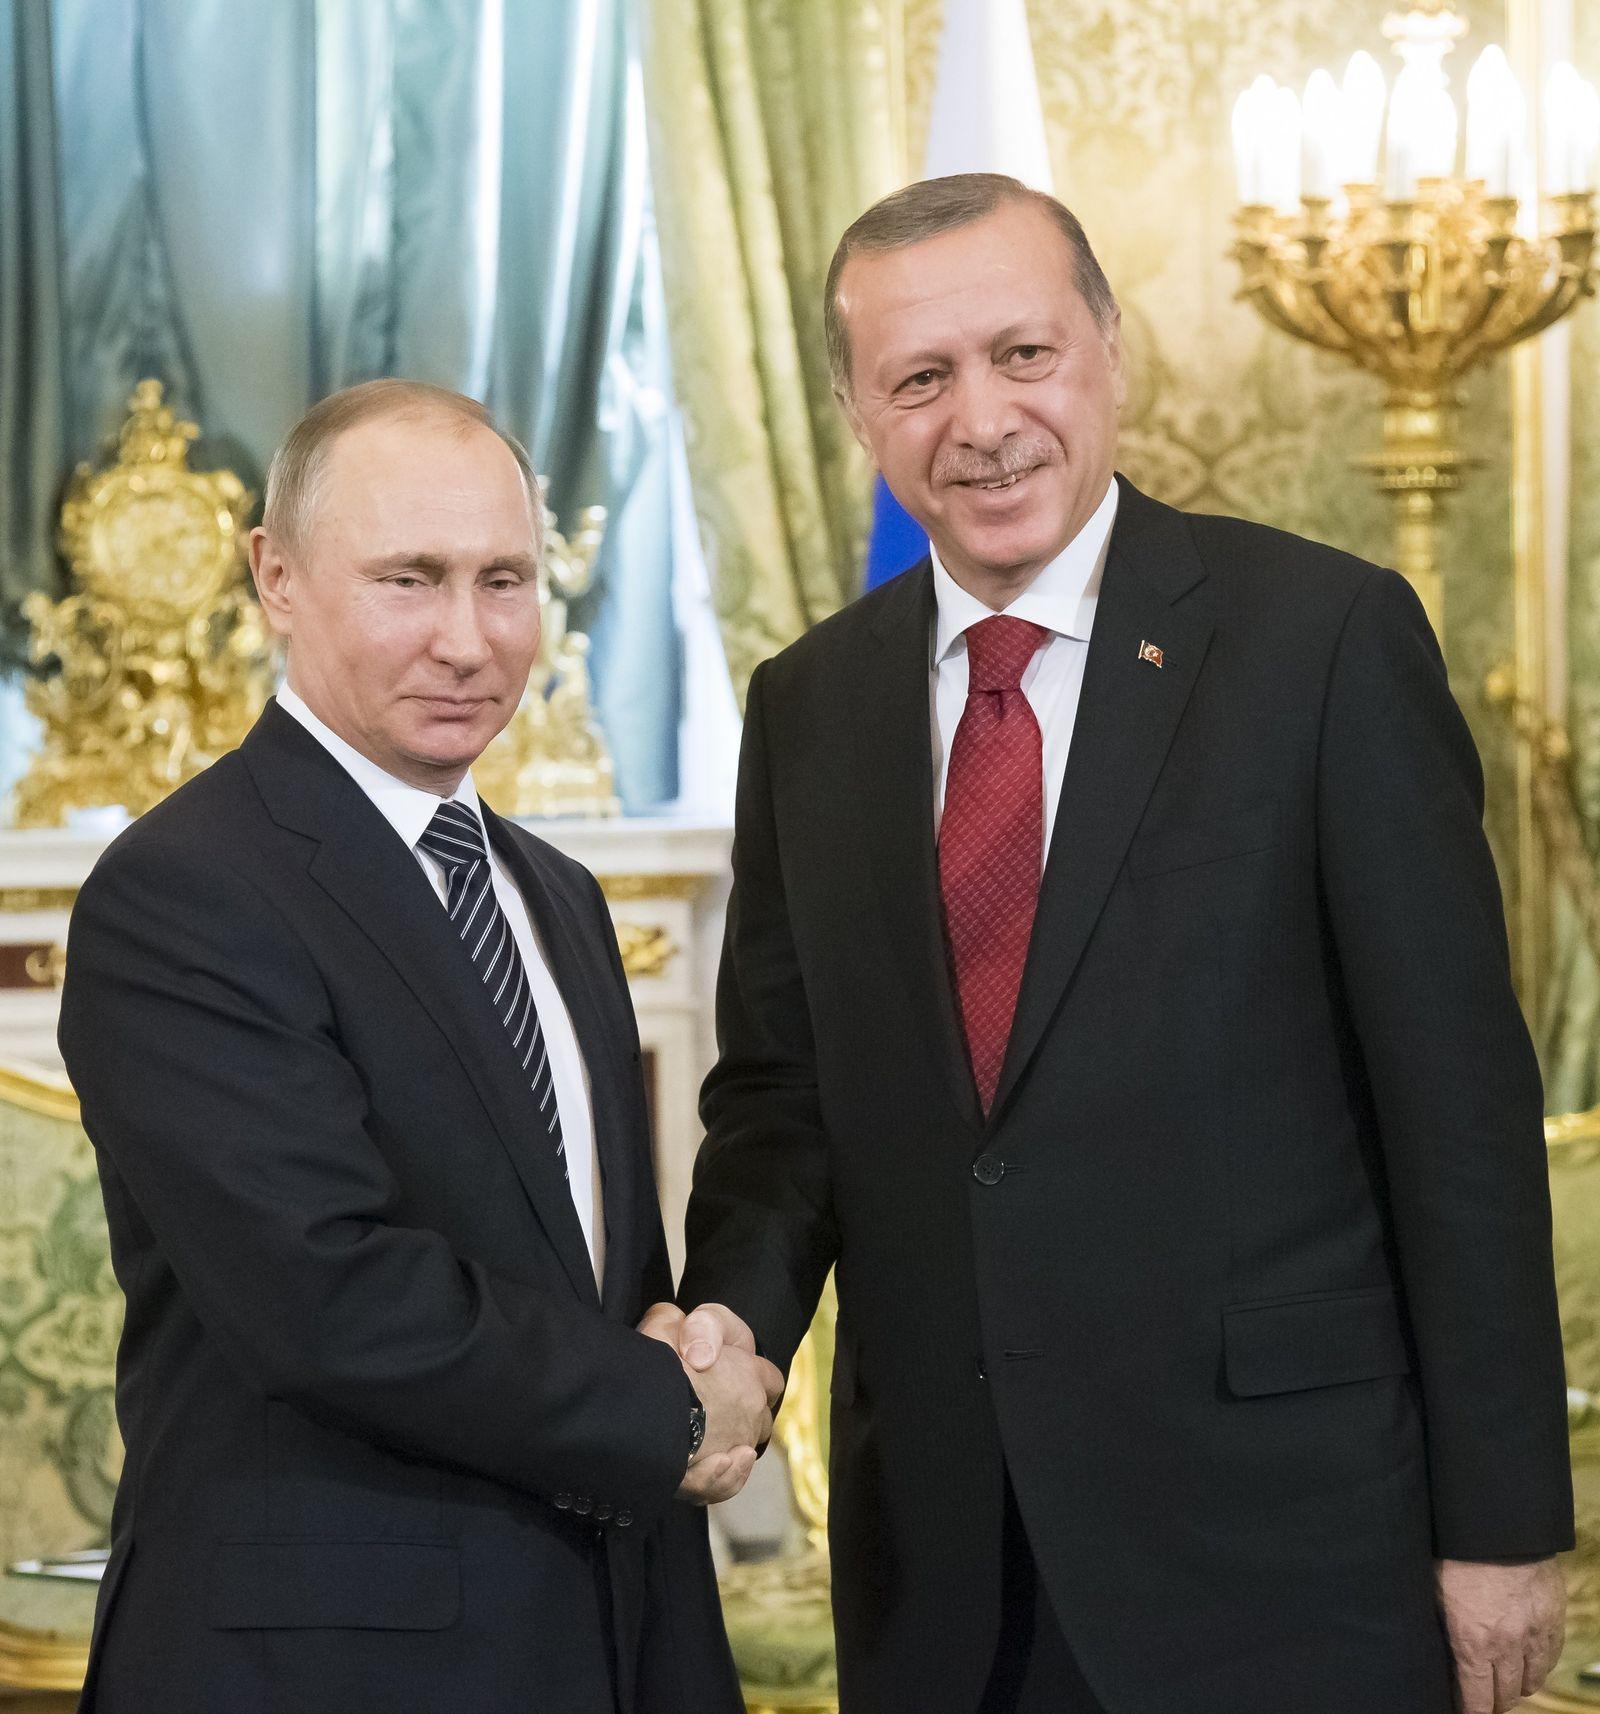 Wladimir Putin/Recep Tayyip Erdogan